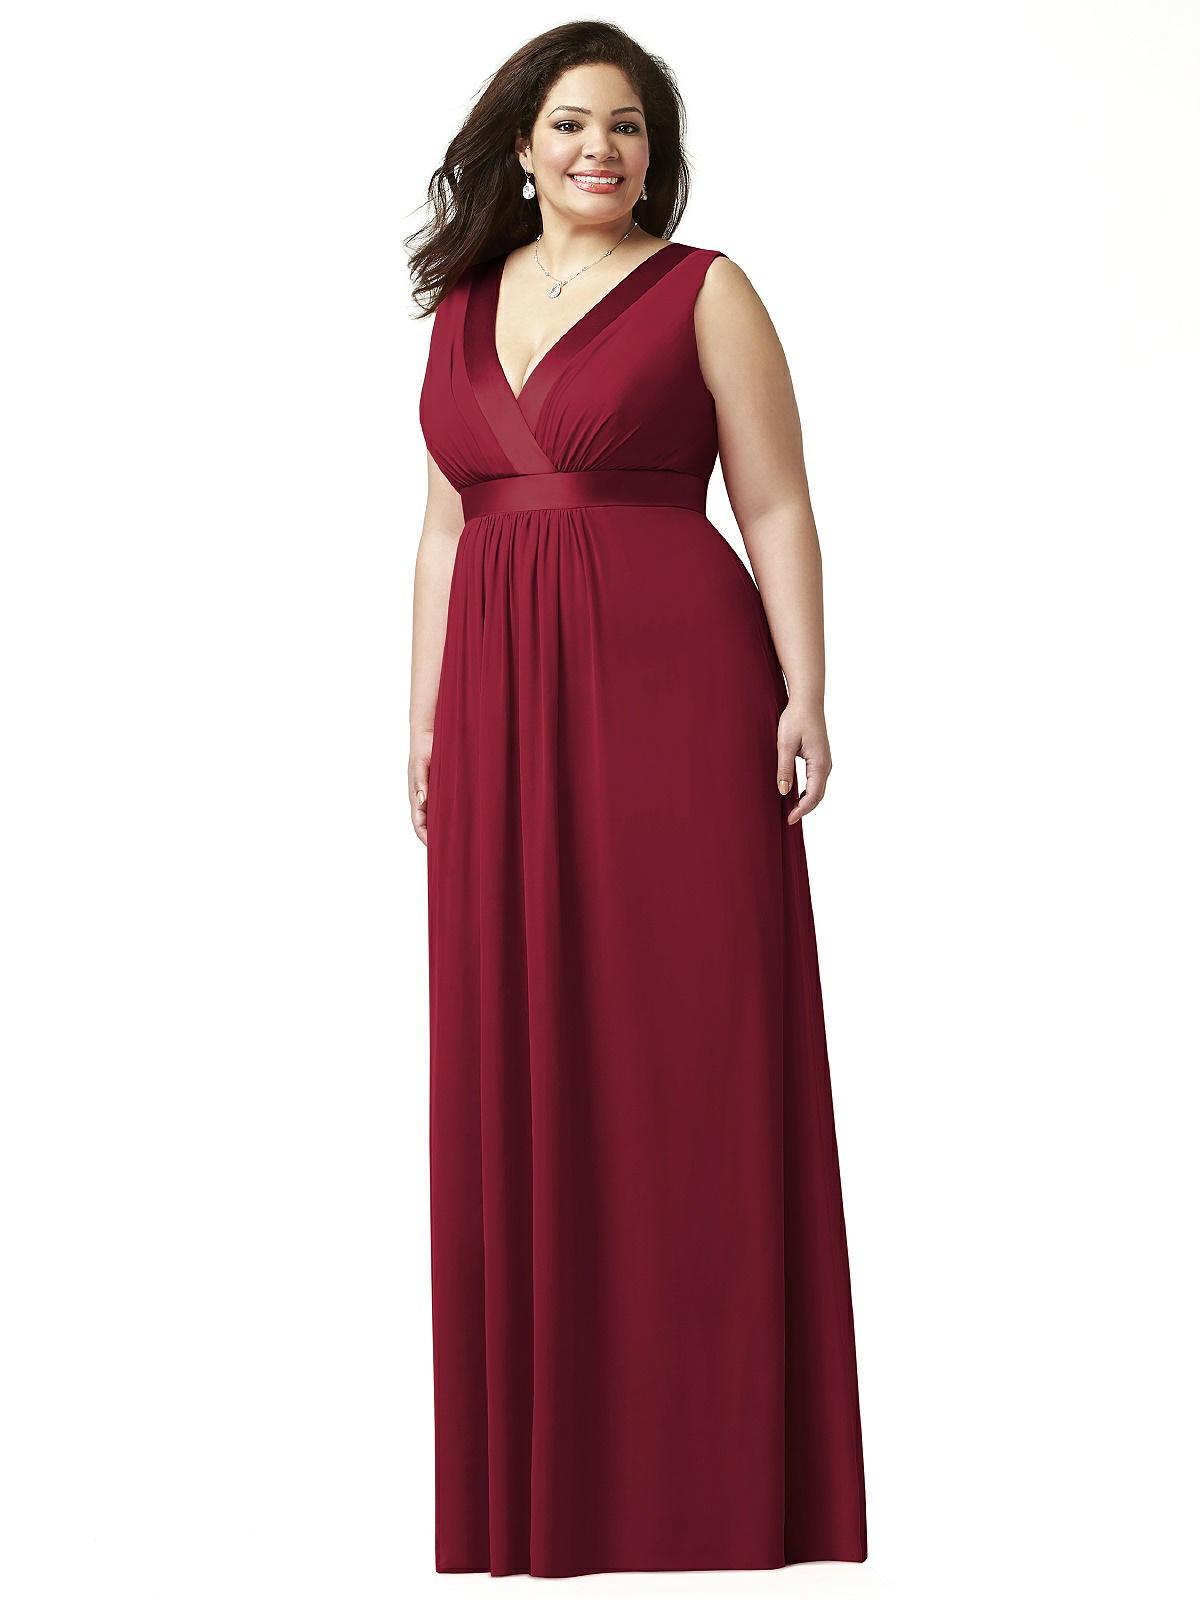 Lovelie Plus Size Bridesmaid Dress 9001 The Dessy Group